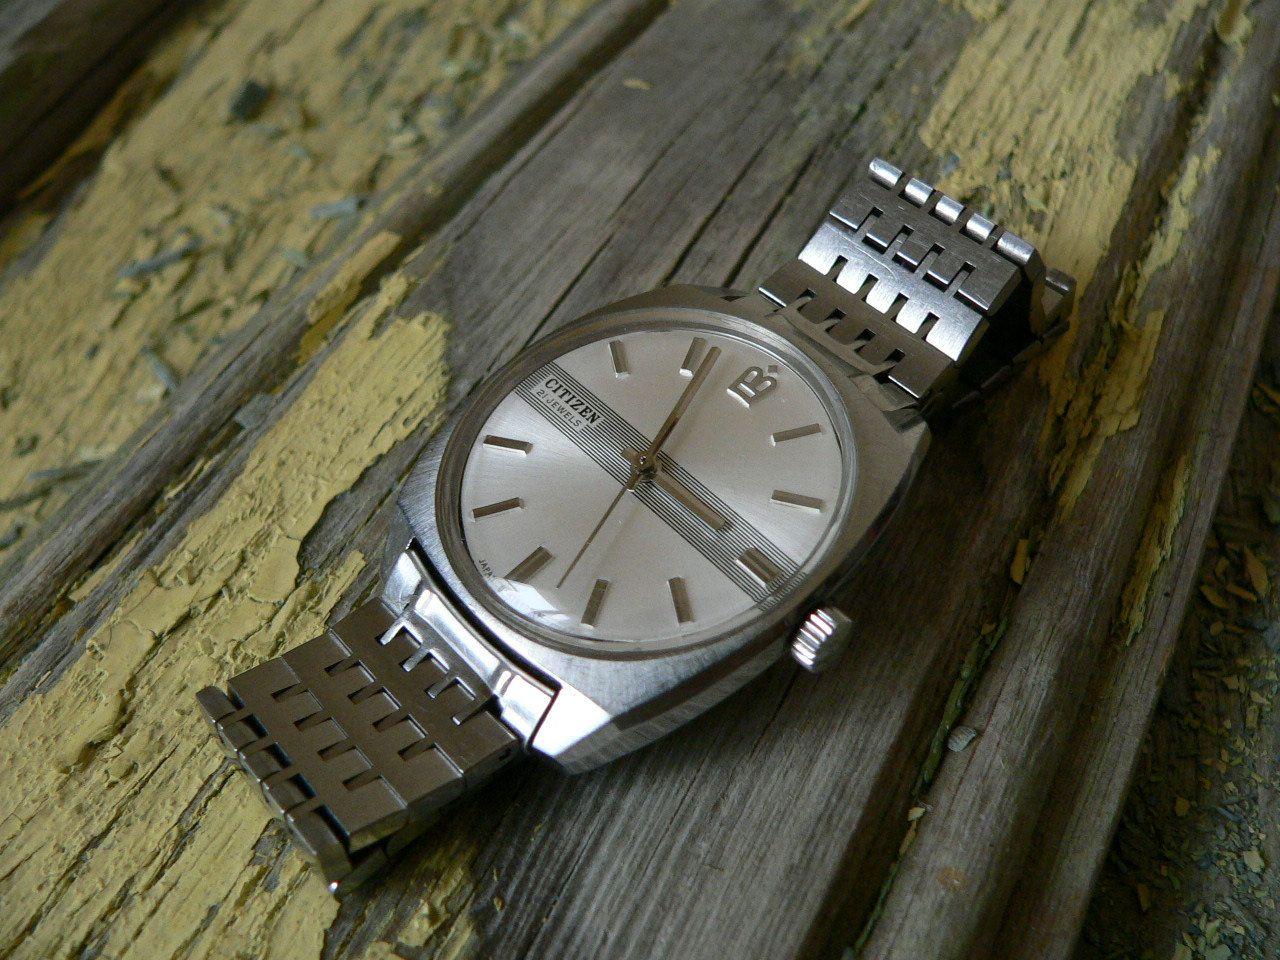 vintage citizen 21 j manual wind men s japan watch 70 s serviced rh pinterest com citizen watch manual e650 citizen watch manual e820